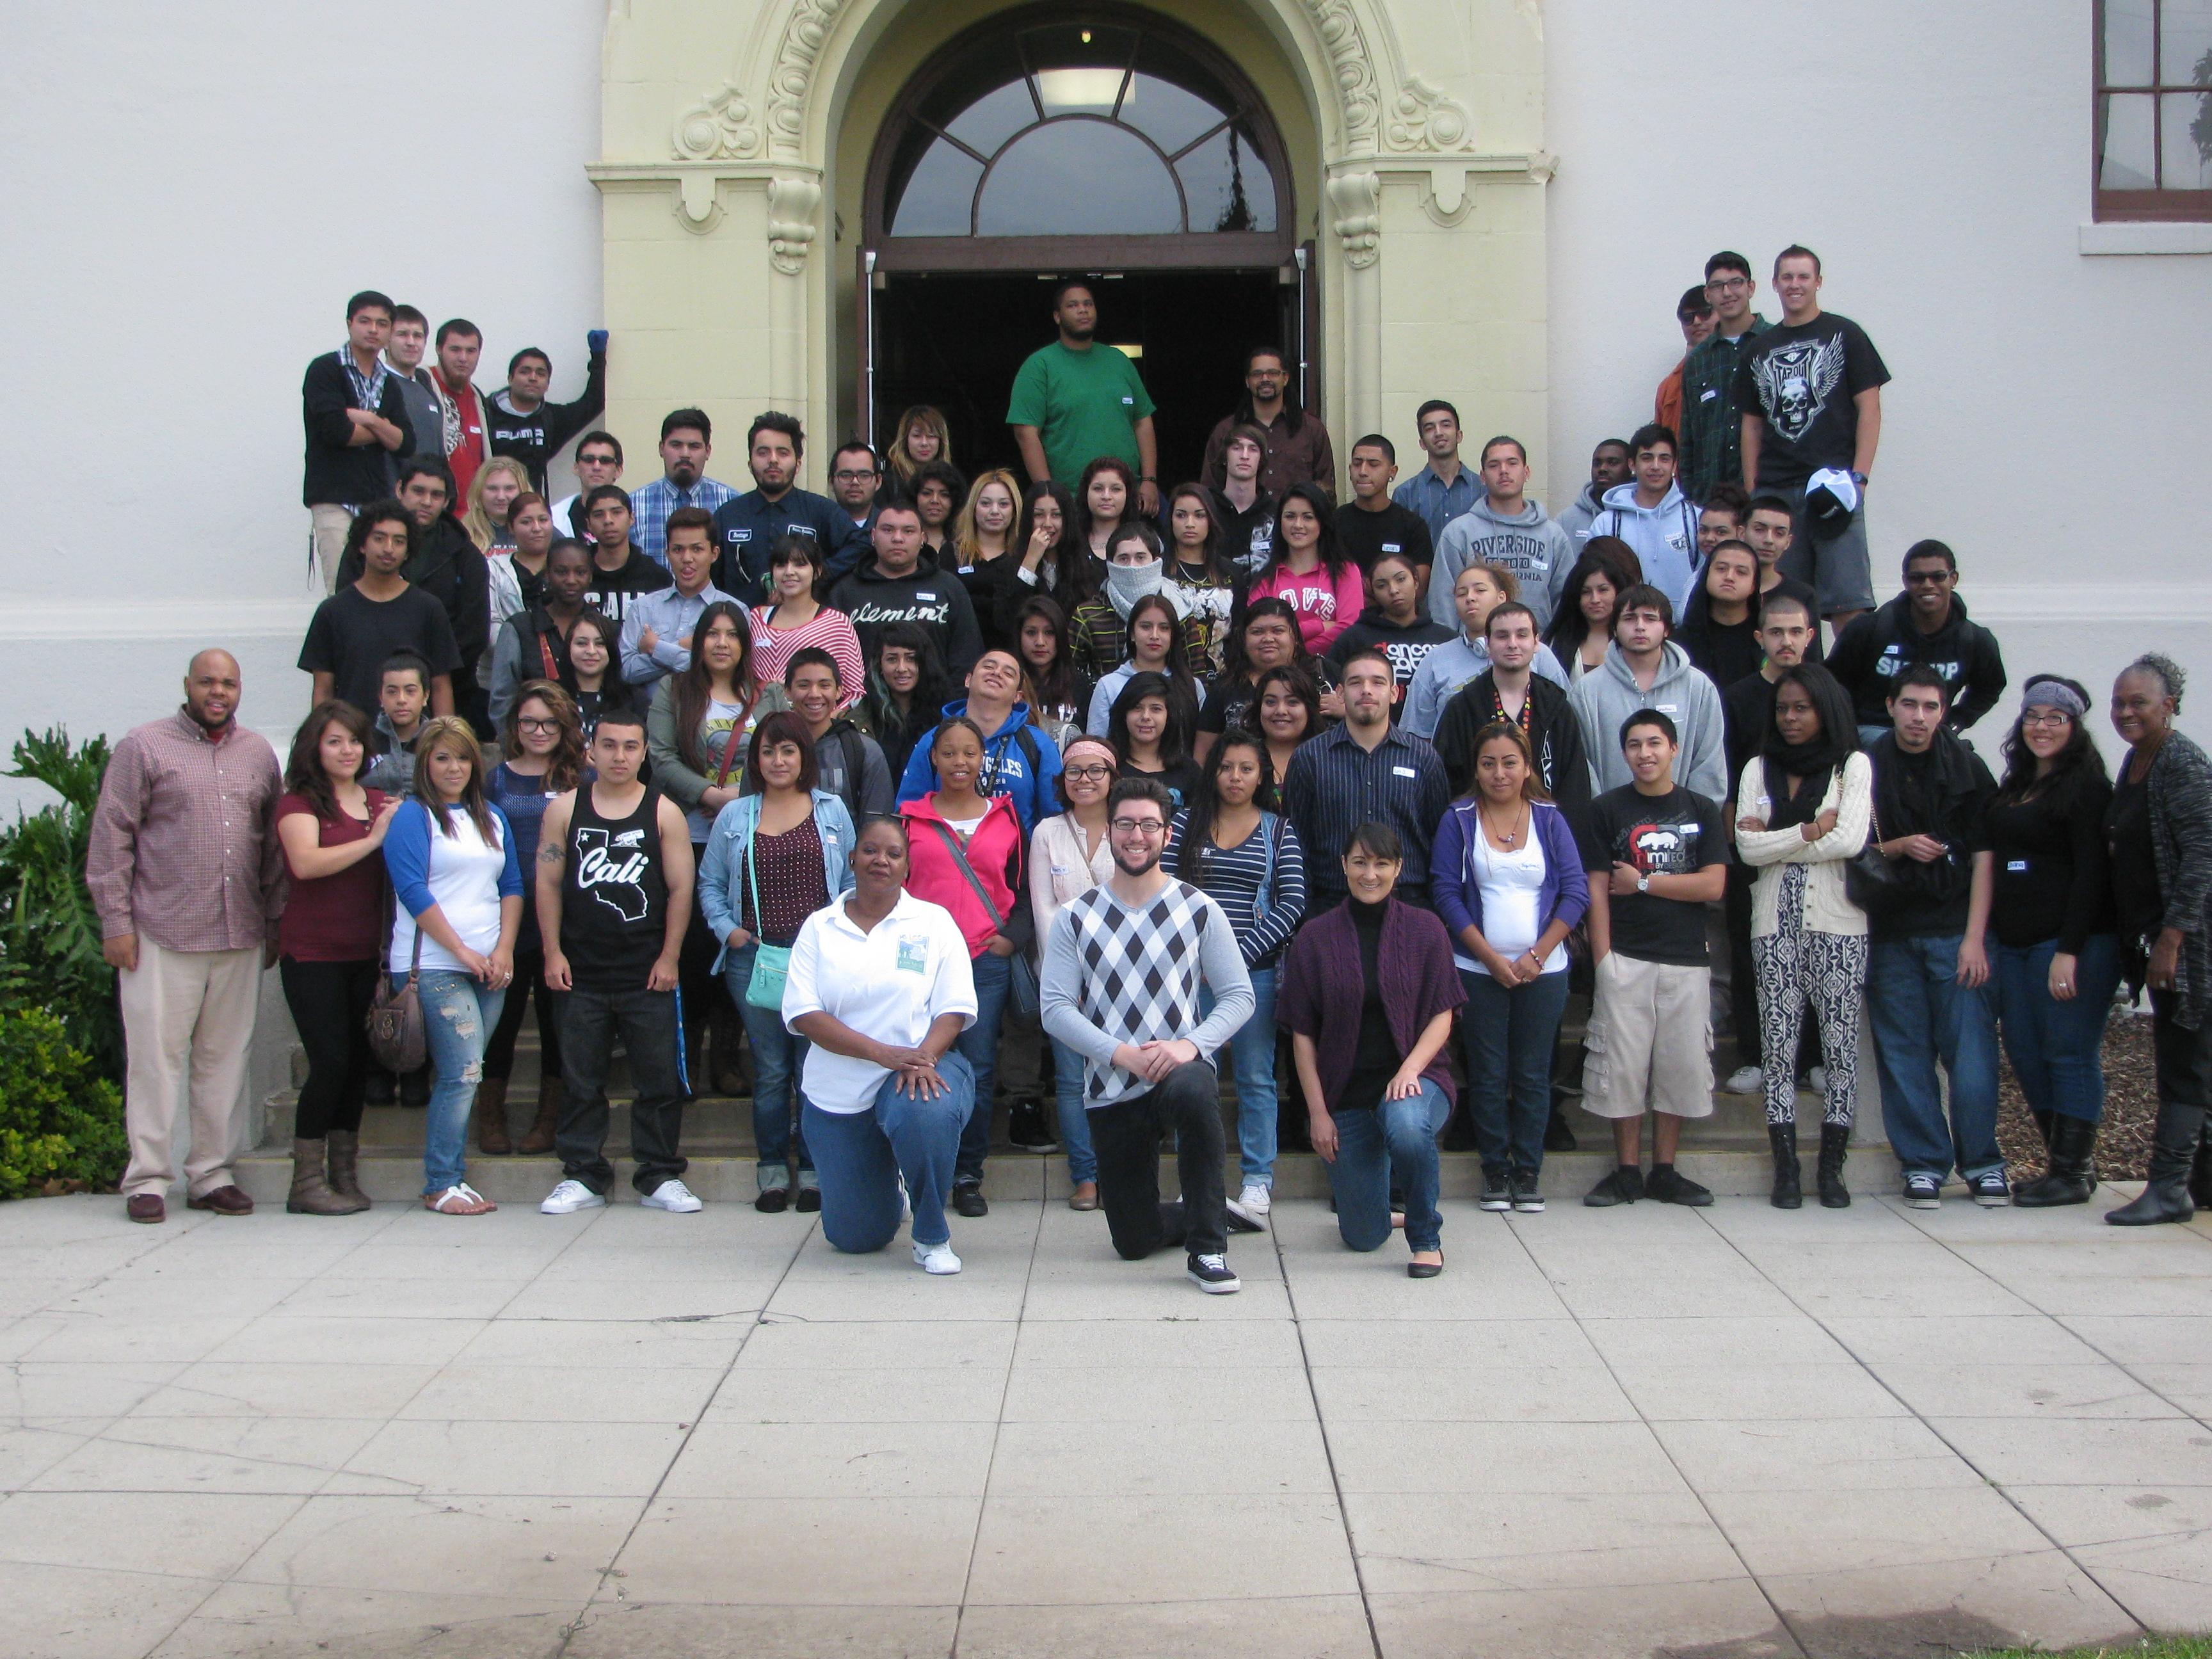 john muir charter schools riverside heritage wioa program